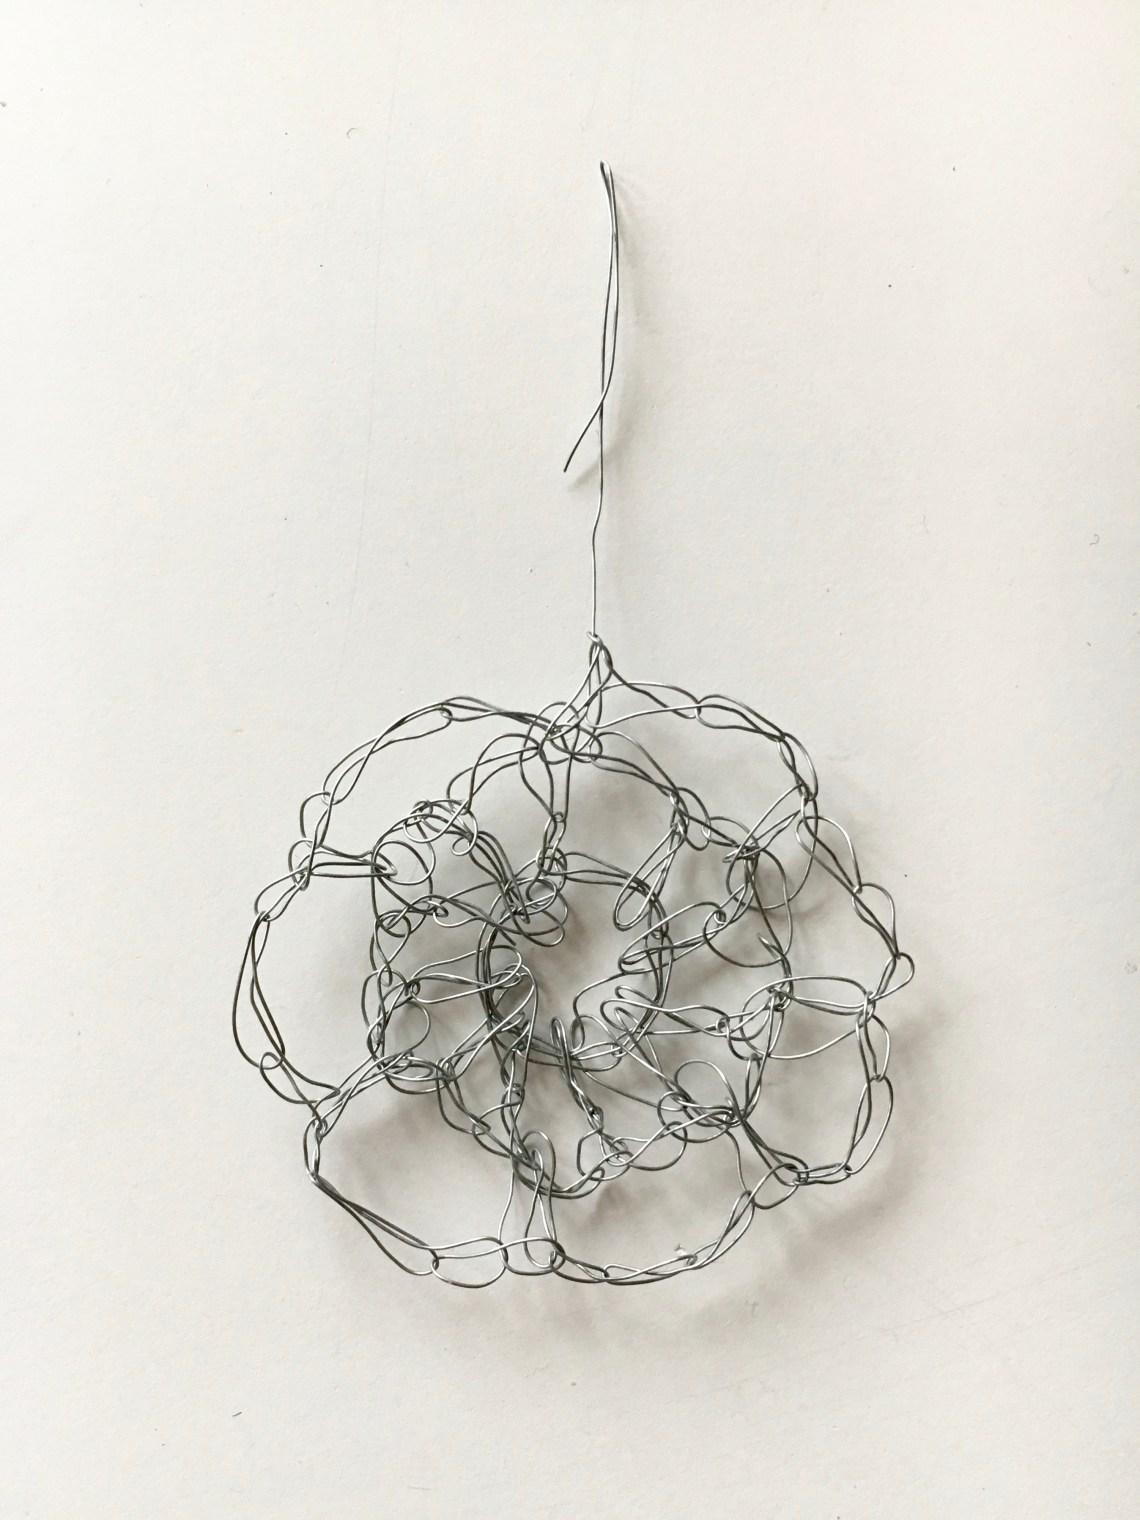 A crochet snowflake pattern which looks like a flower